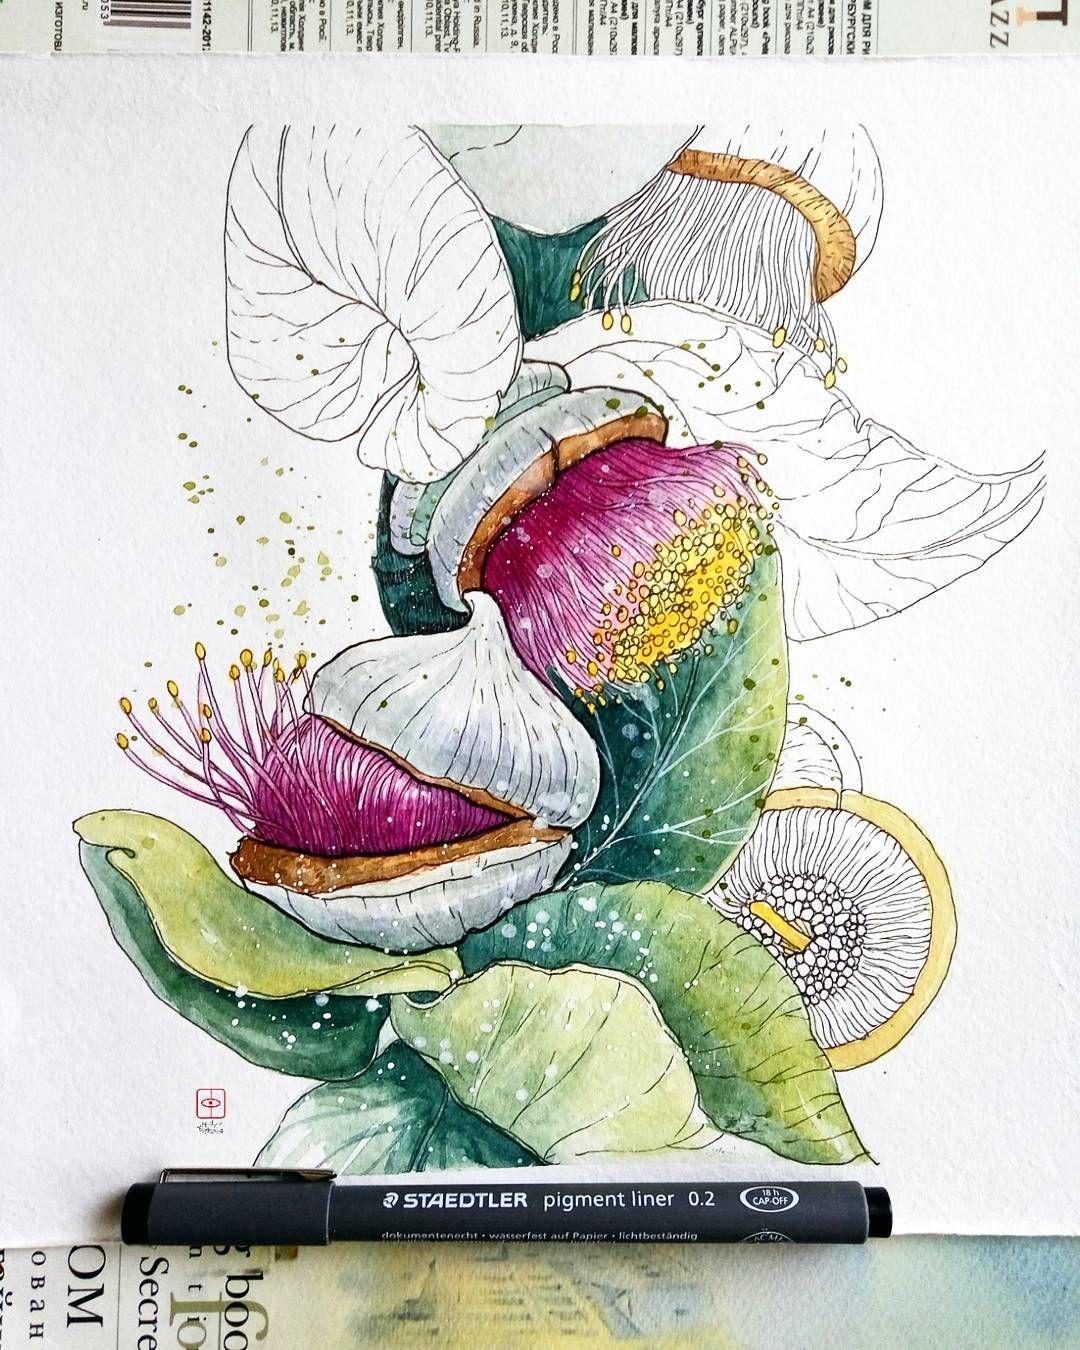 Evkalipt Krupnoplodnyj Ili Malli Roza Eucalyptus Macrocarpa Rose